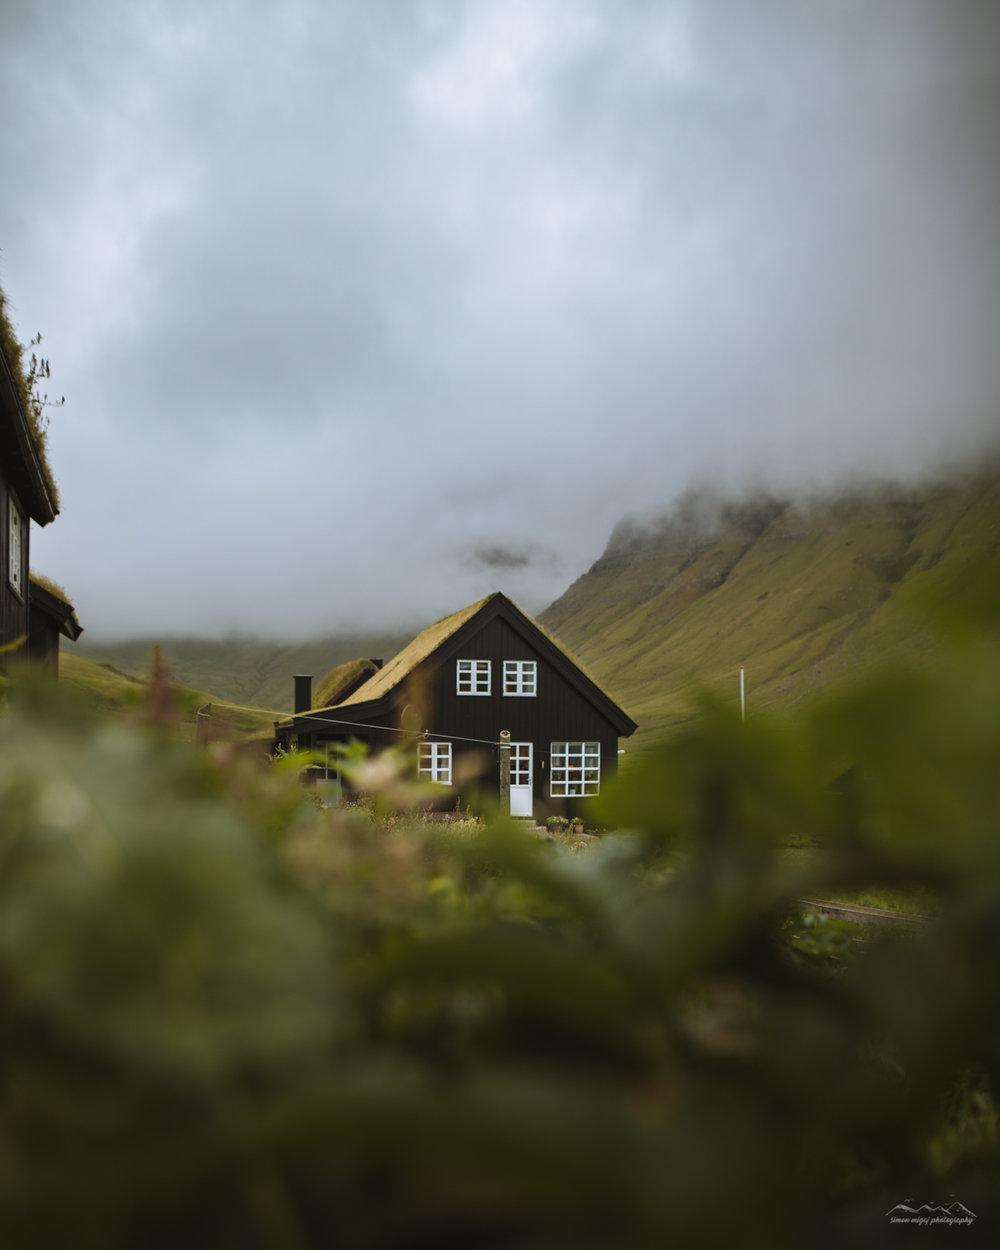 In the village of Gasadalur, Faroe Islands